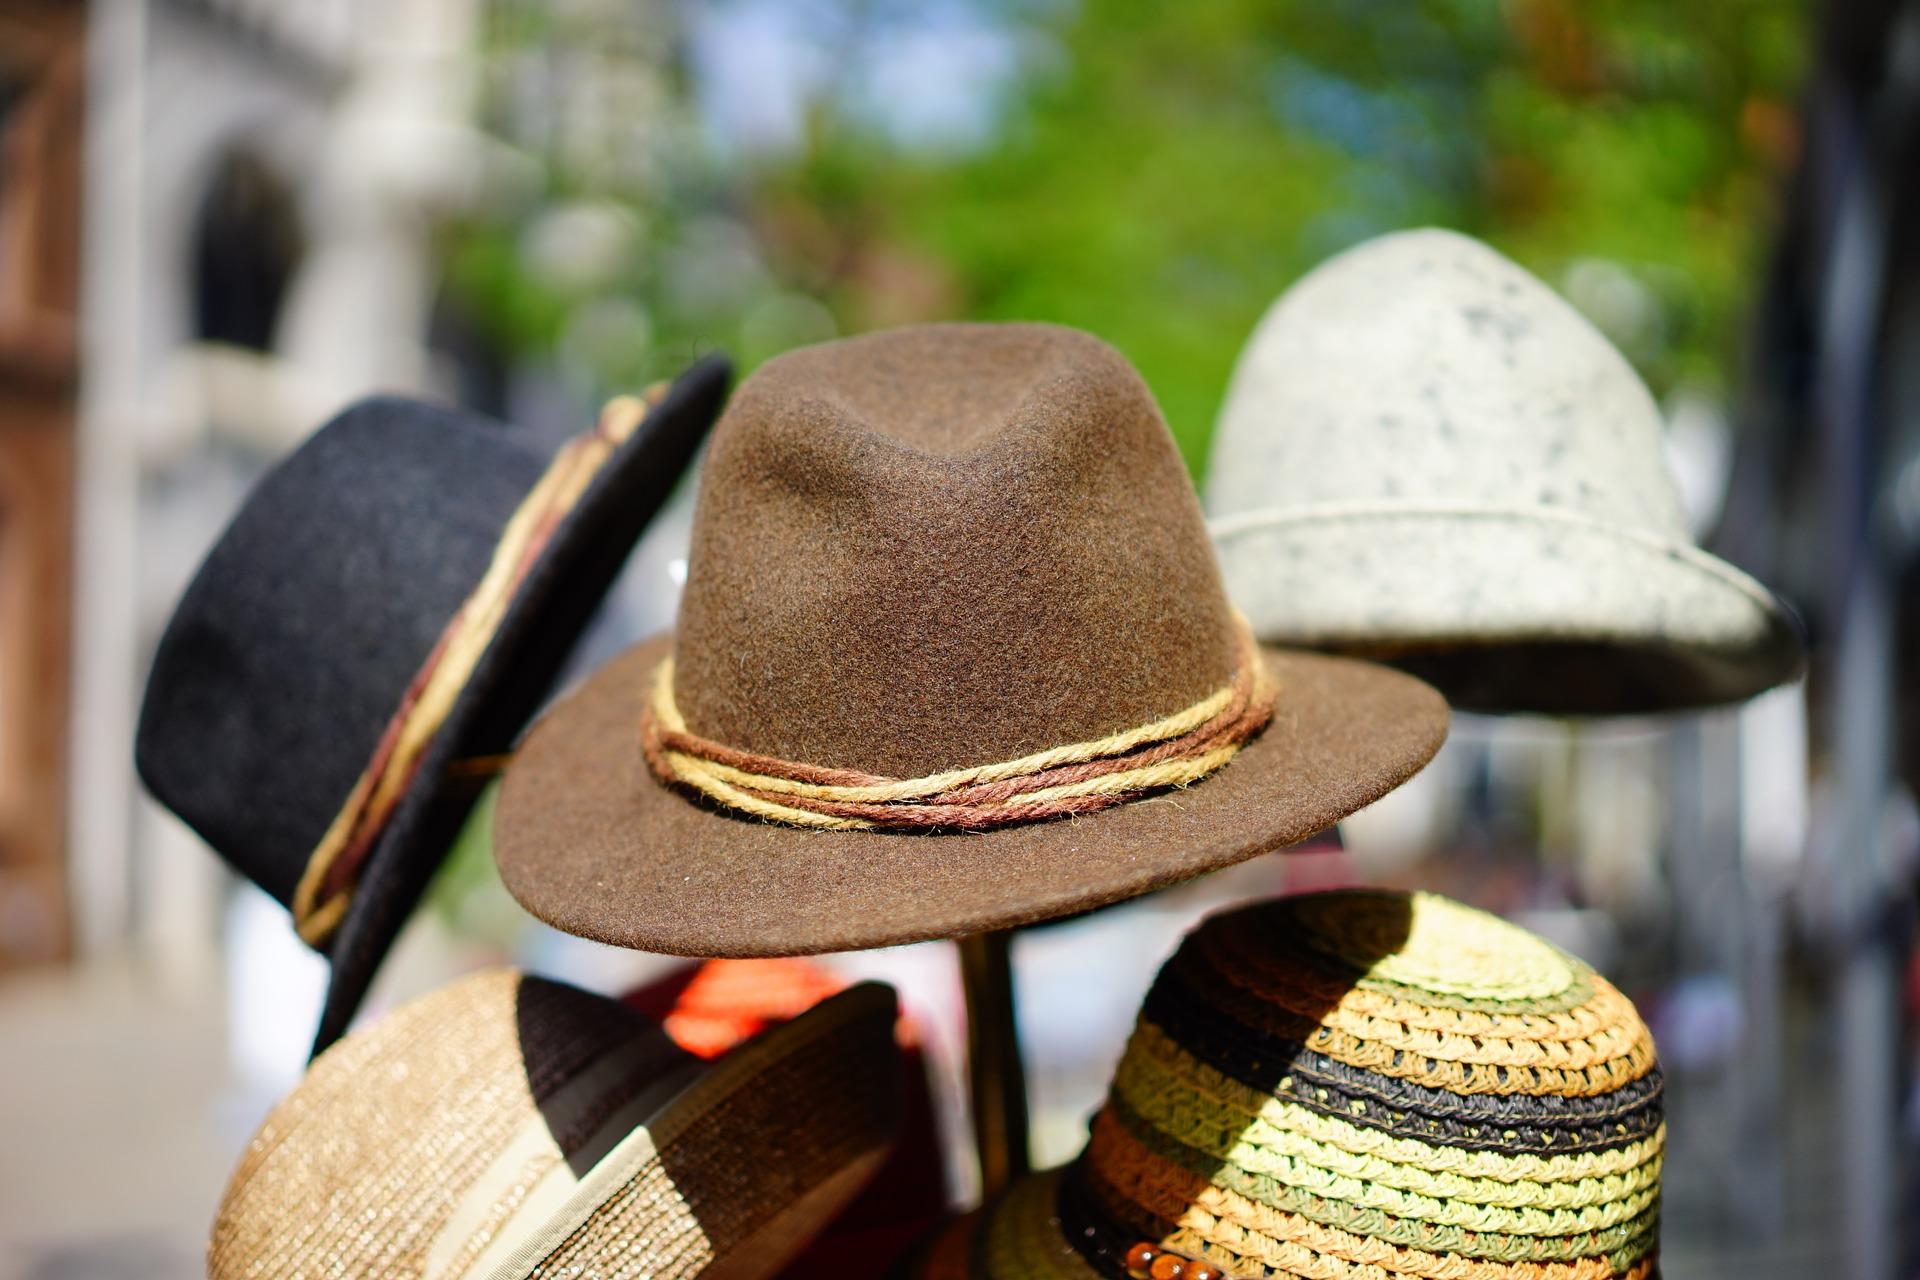 discount hats